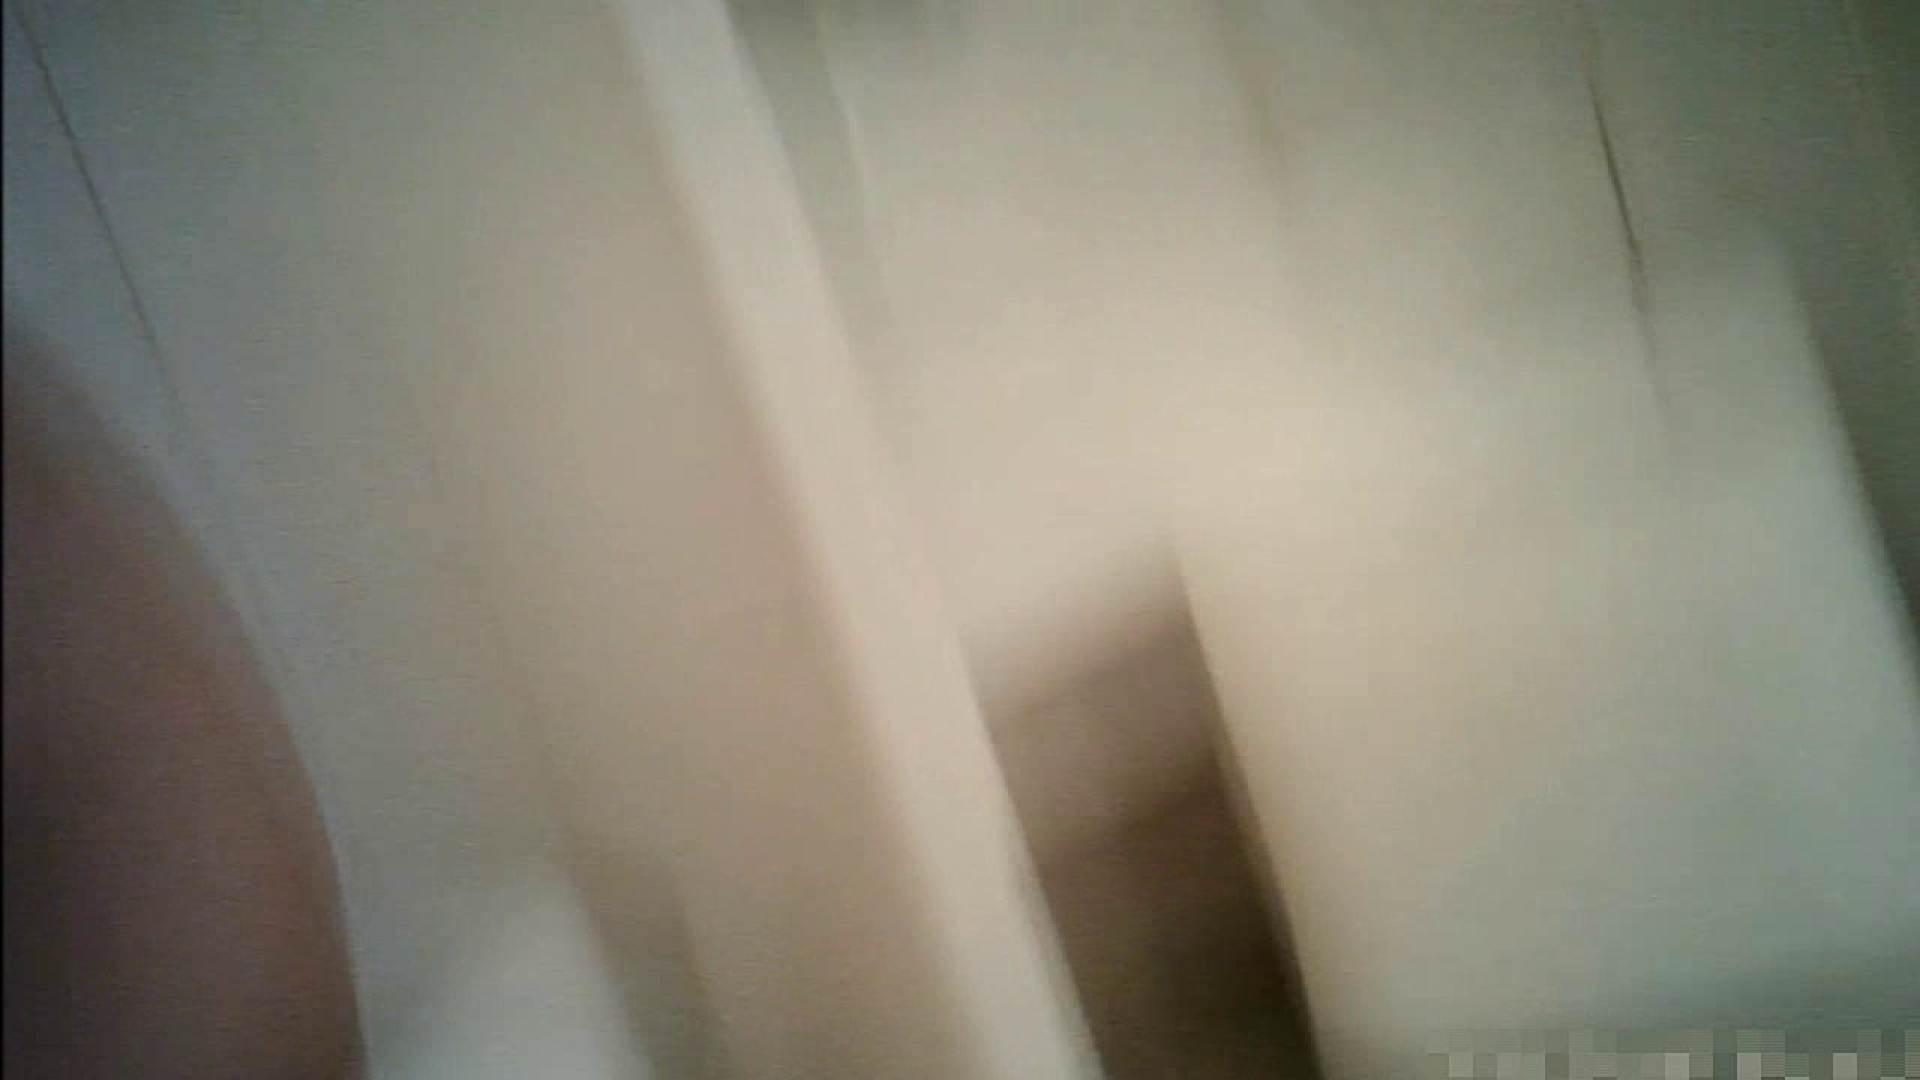 vol.7 【Mちゃん(入浴)】ブランド品査定士19歳 巨乳ギャル キャバ嬢 AV動画キャプチャ 99枚 63